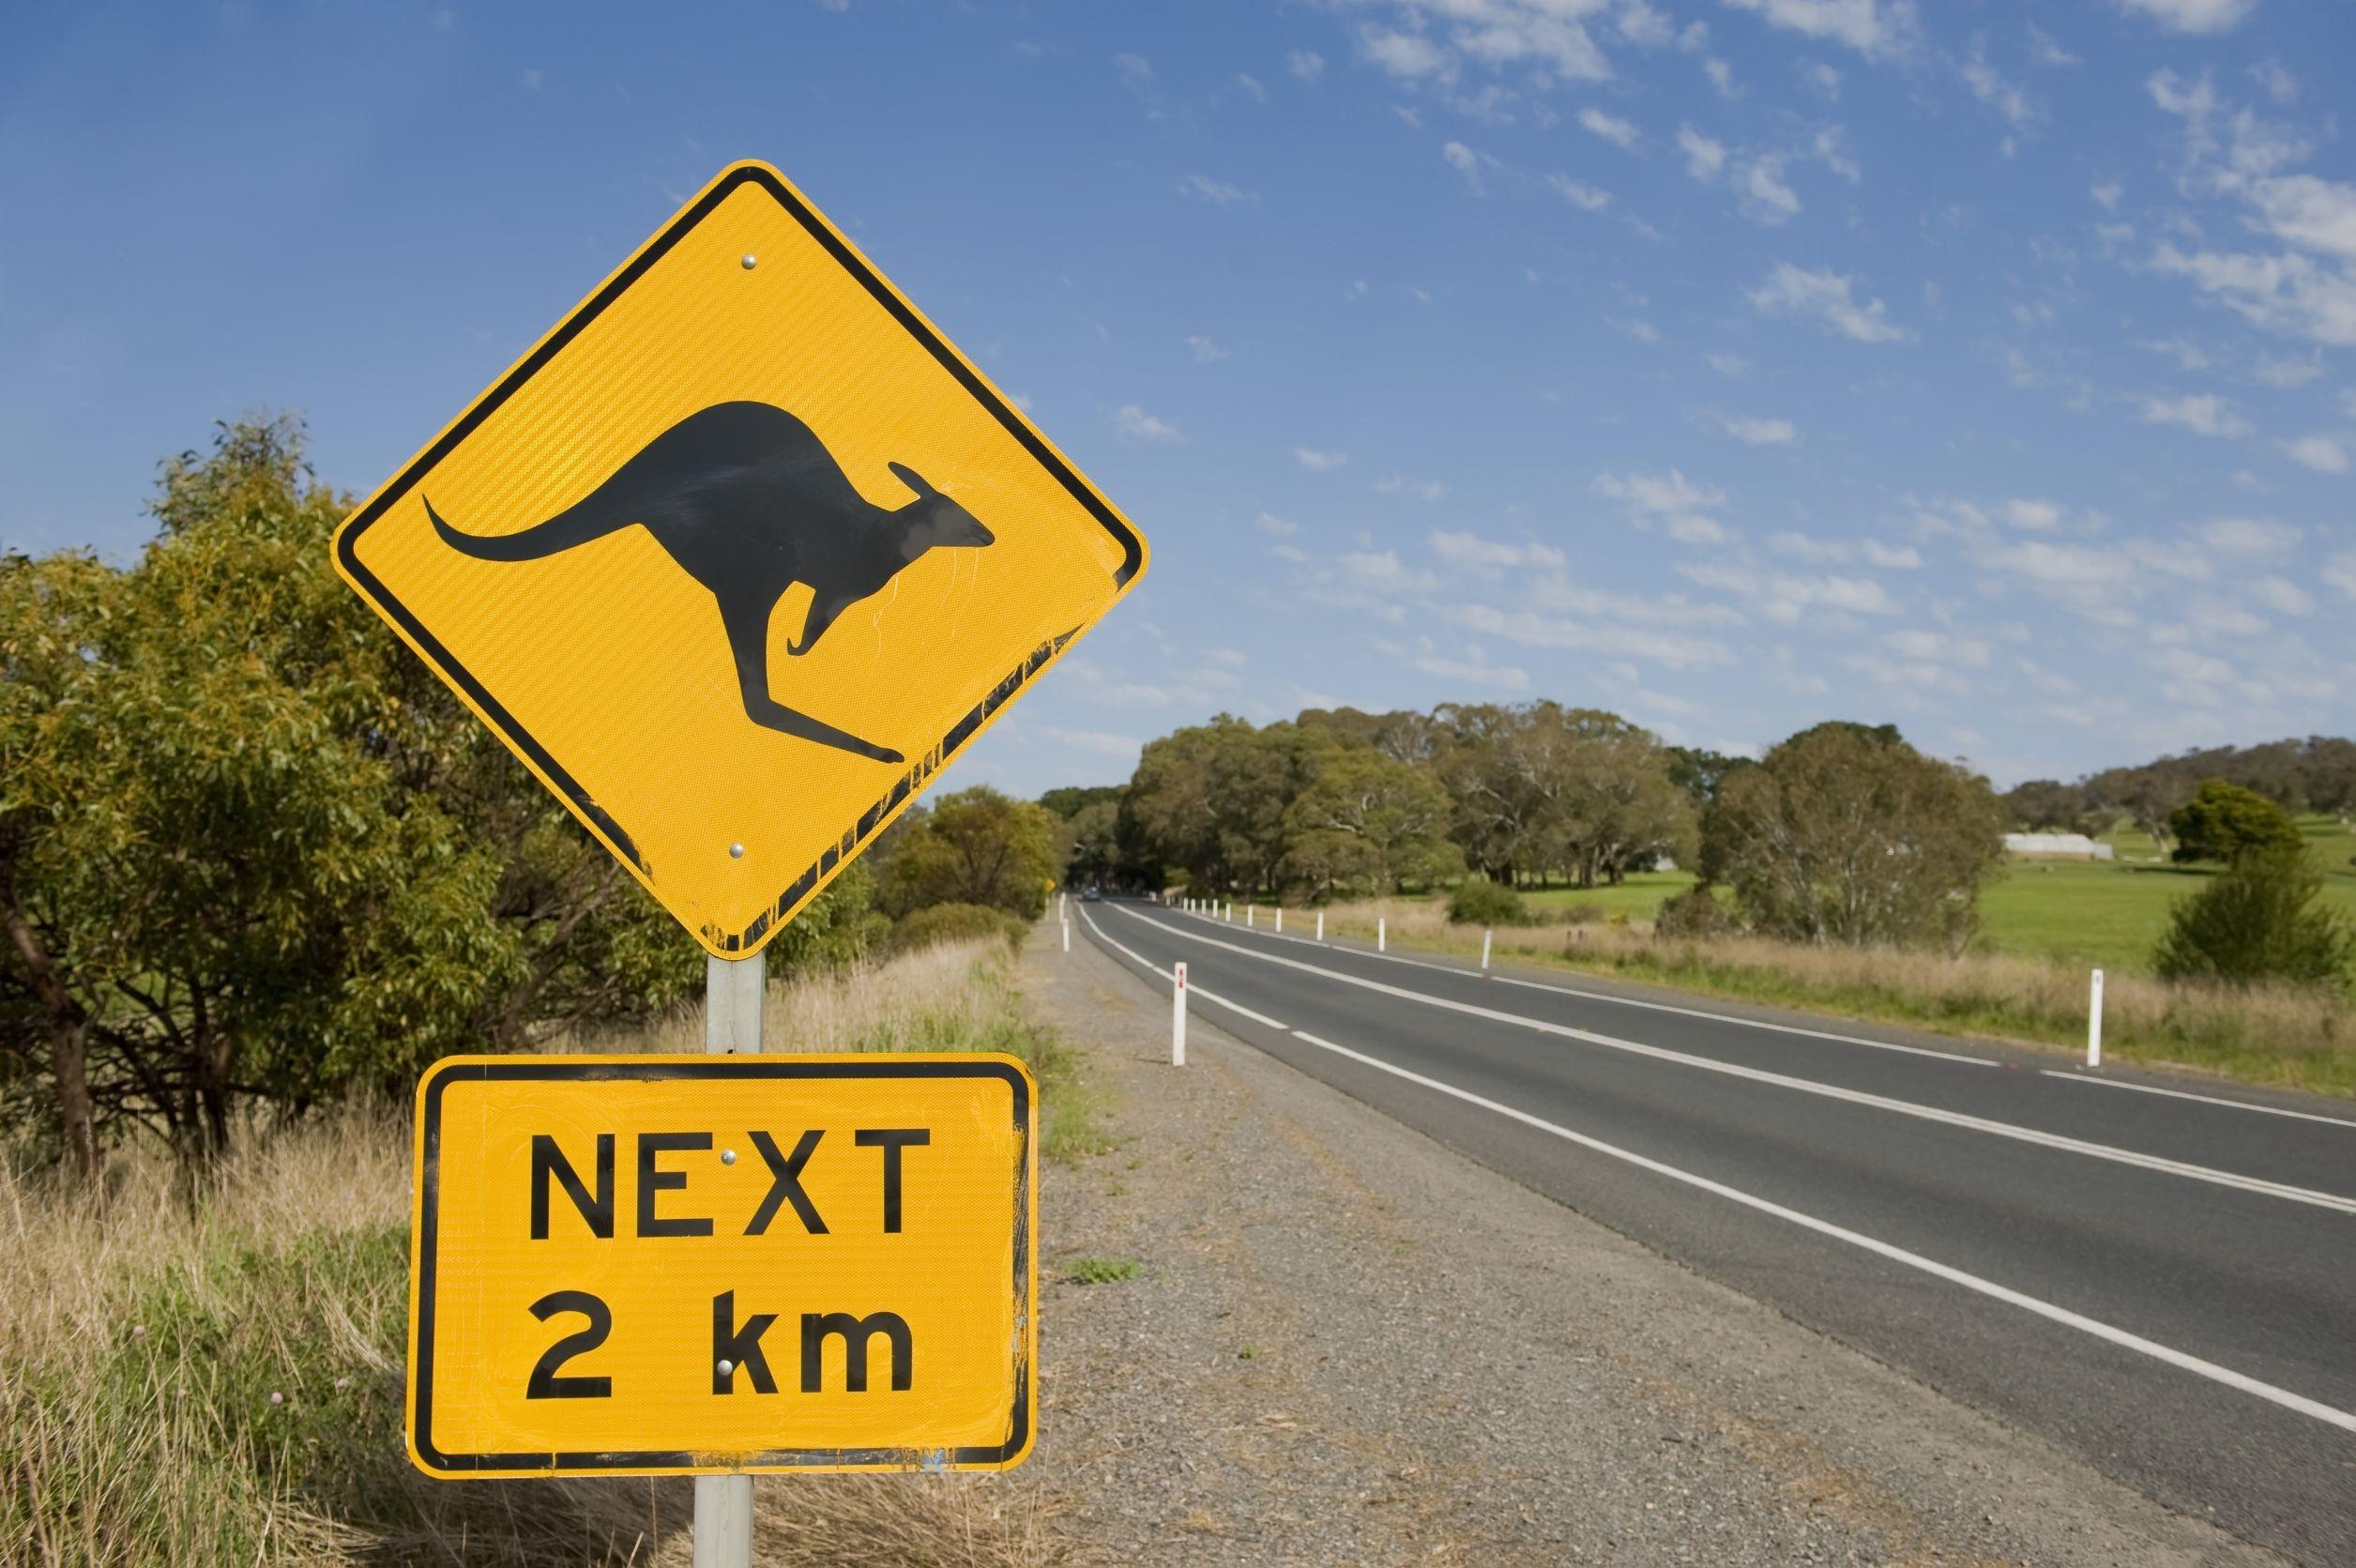 kangaroo-road-sign-australia